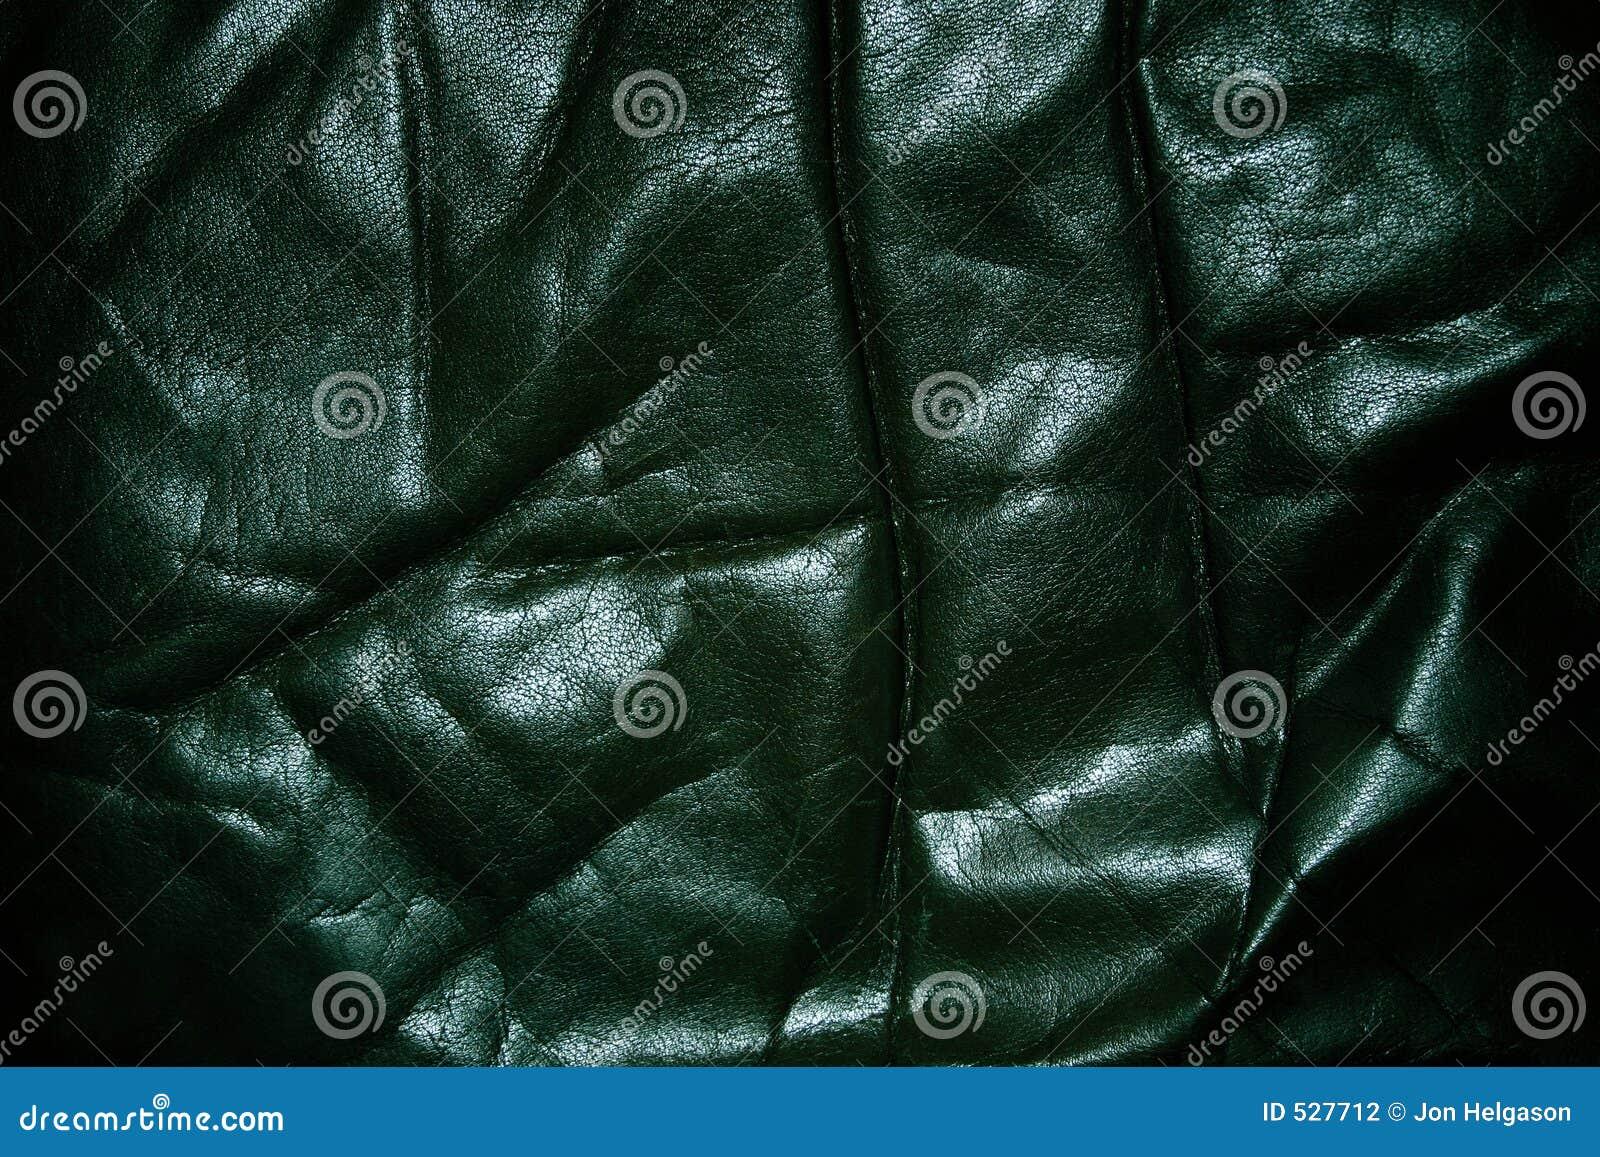 Download 起皱纹的黑色皮革老 库存照片. 图片 包括有 黑暗, 映射, 模式, 皮革, 原稿, 商业, 推车, 爆沸, 敌意 - 527712